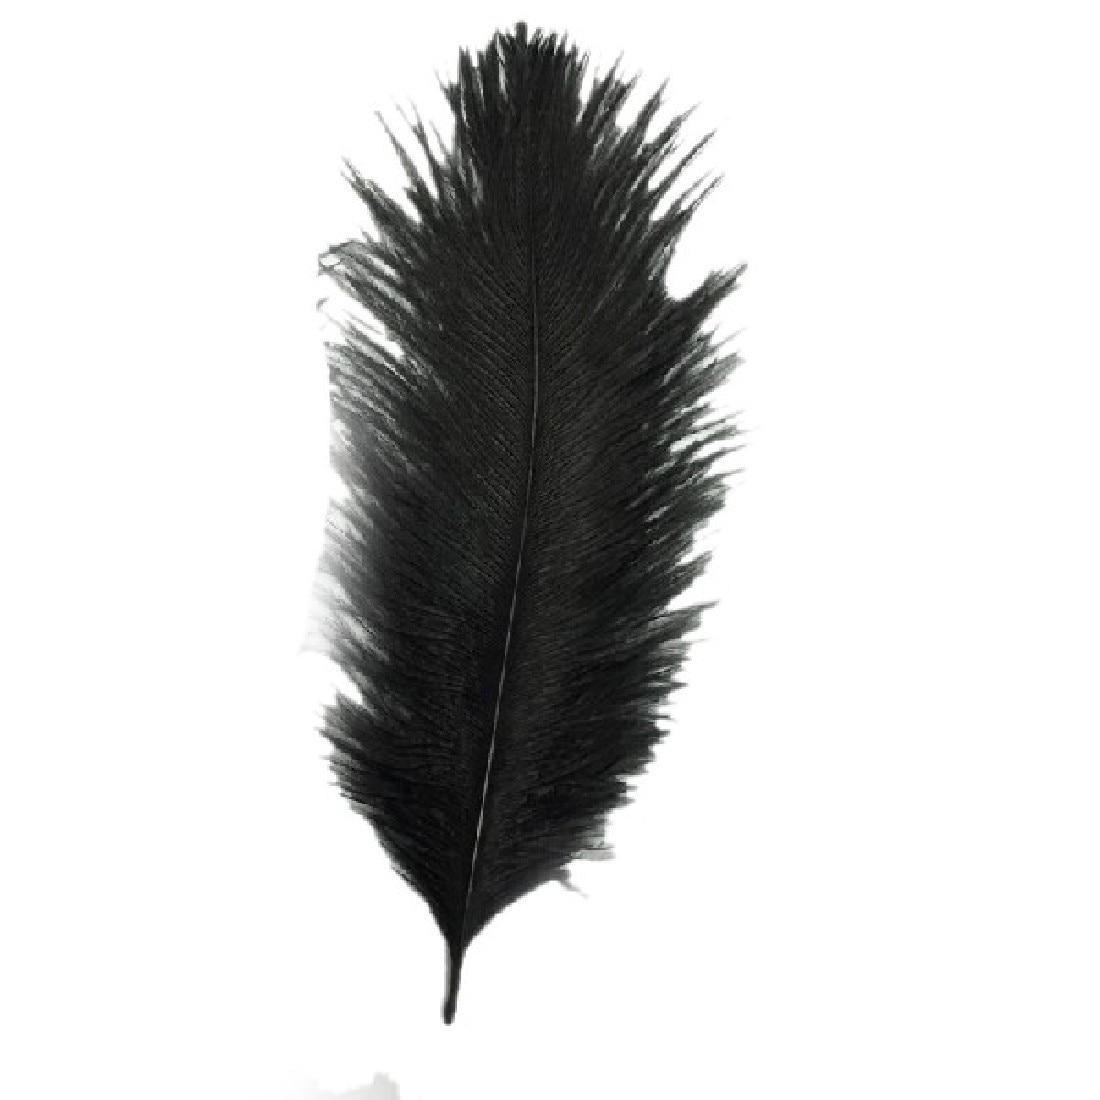 White craft feathers bulk - Free Shipping Hotsale 10pcs Beautiful Ostrich Feather 15 20 Cm Wedding Decoration Party Plumage Decorative